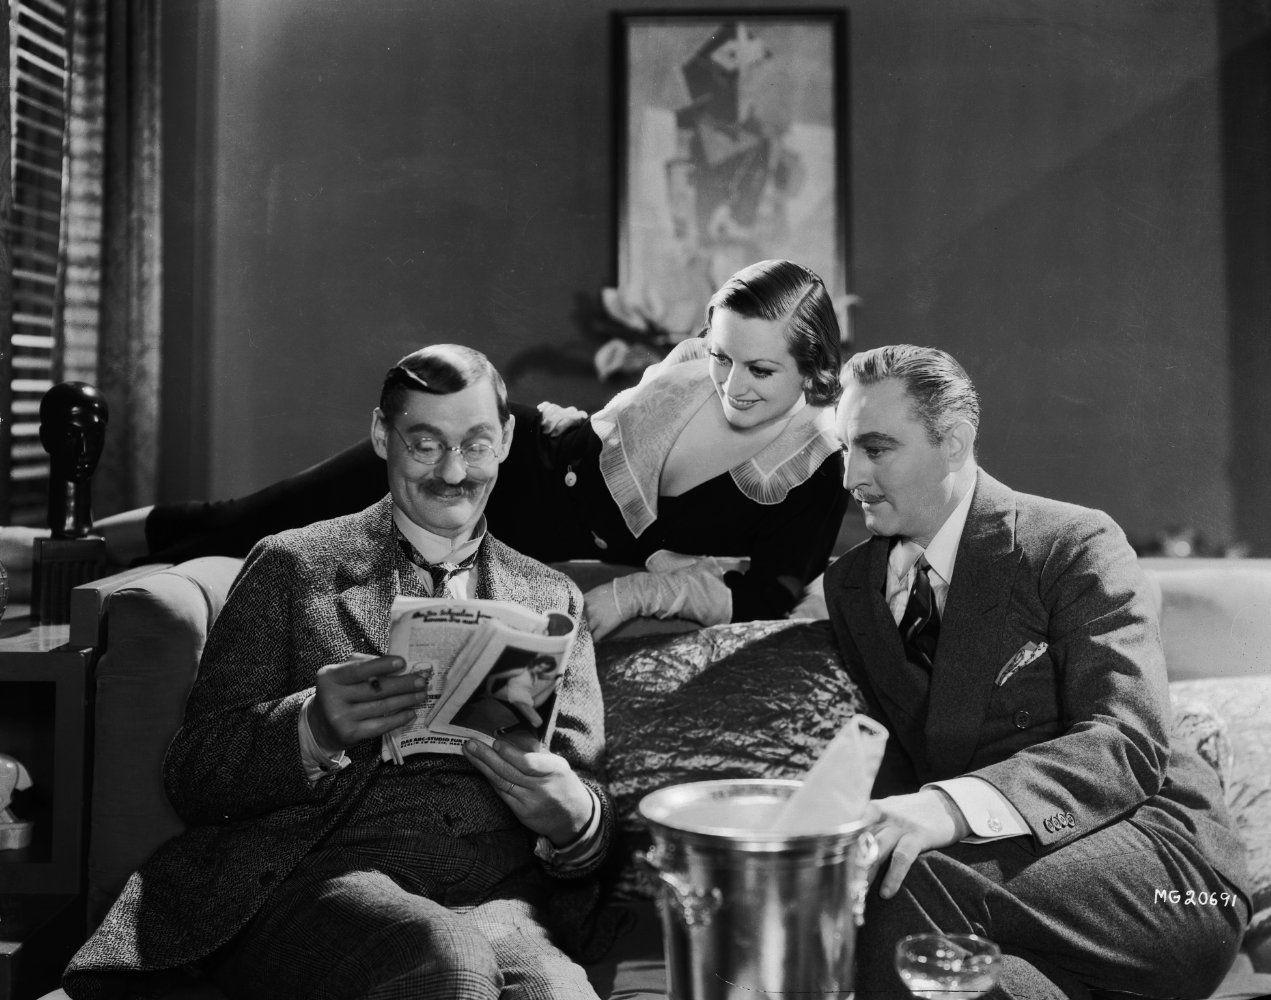 Joan Crawford and John Barrymore Grand Hotel In